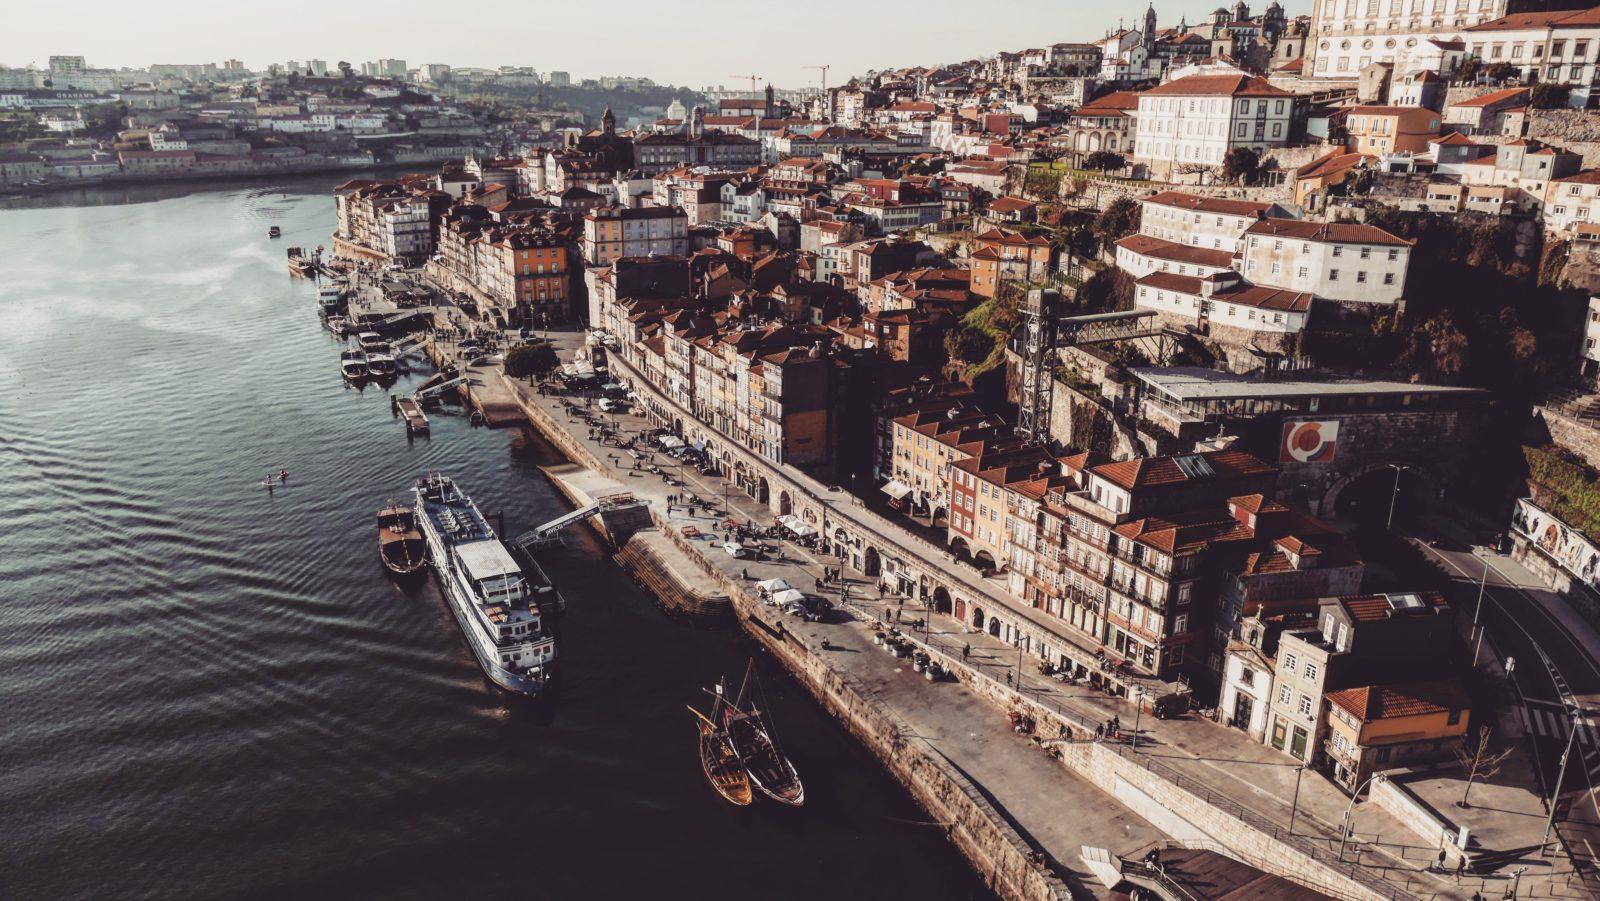 PORTUGALIA: PORTO - CO, GDZIE i ZA ILE?